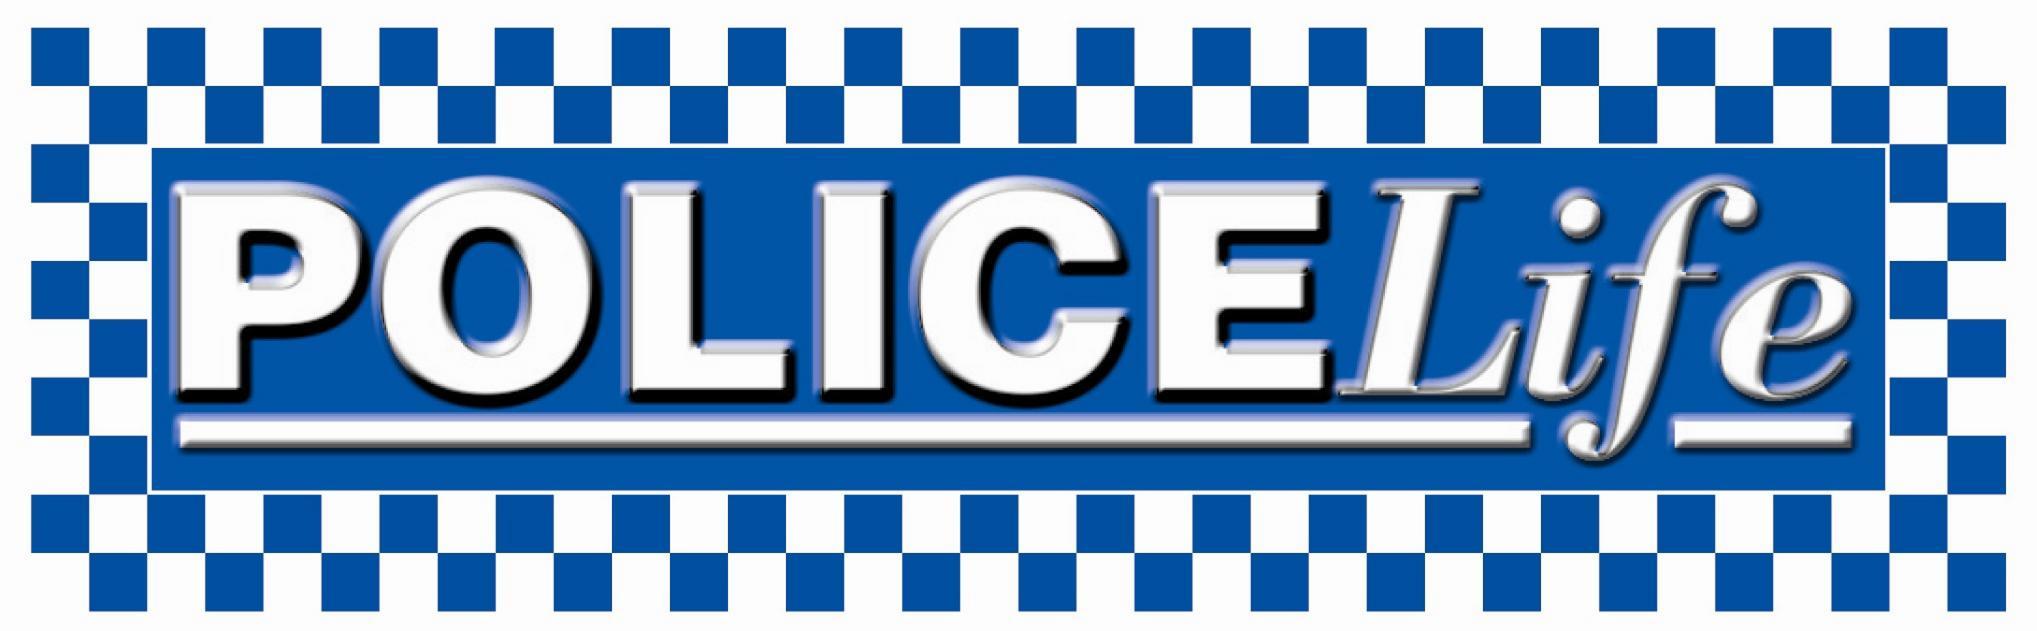 200-Police-Life